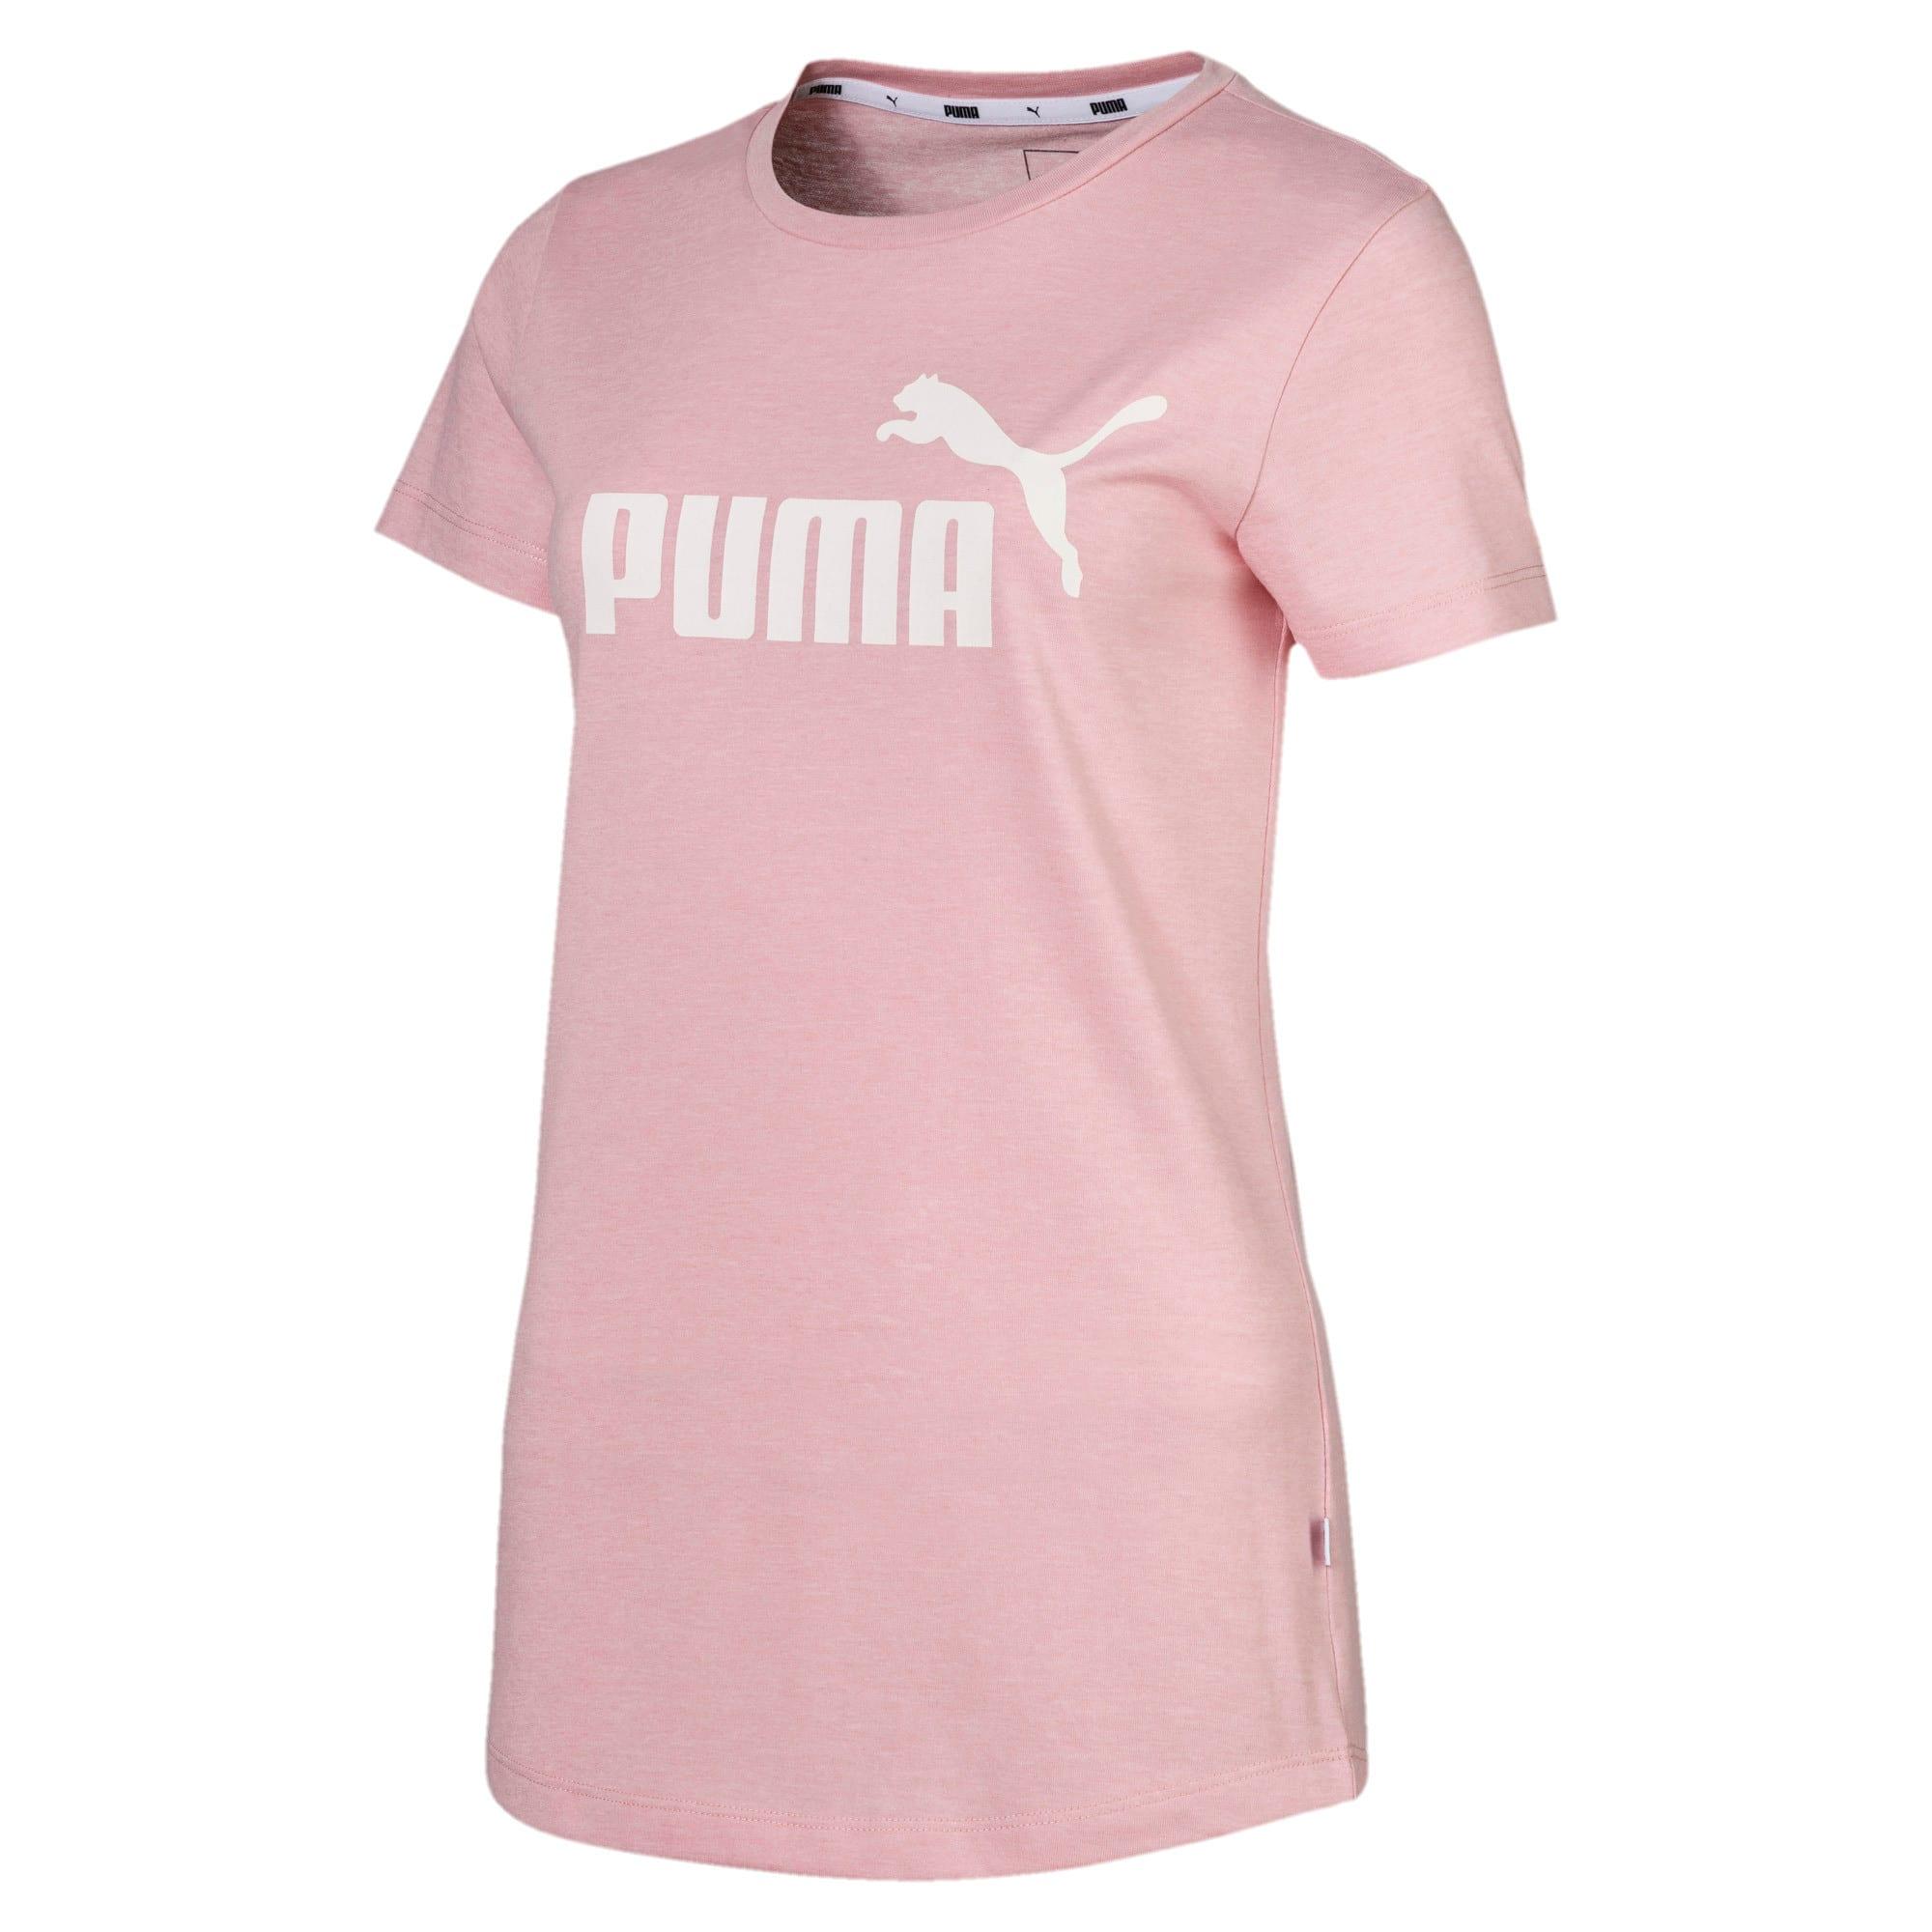 Thumbnail 4 of Essentials Heather Damen T-Shirt, Bridal Rose, medium